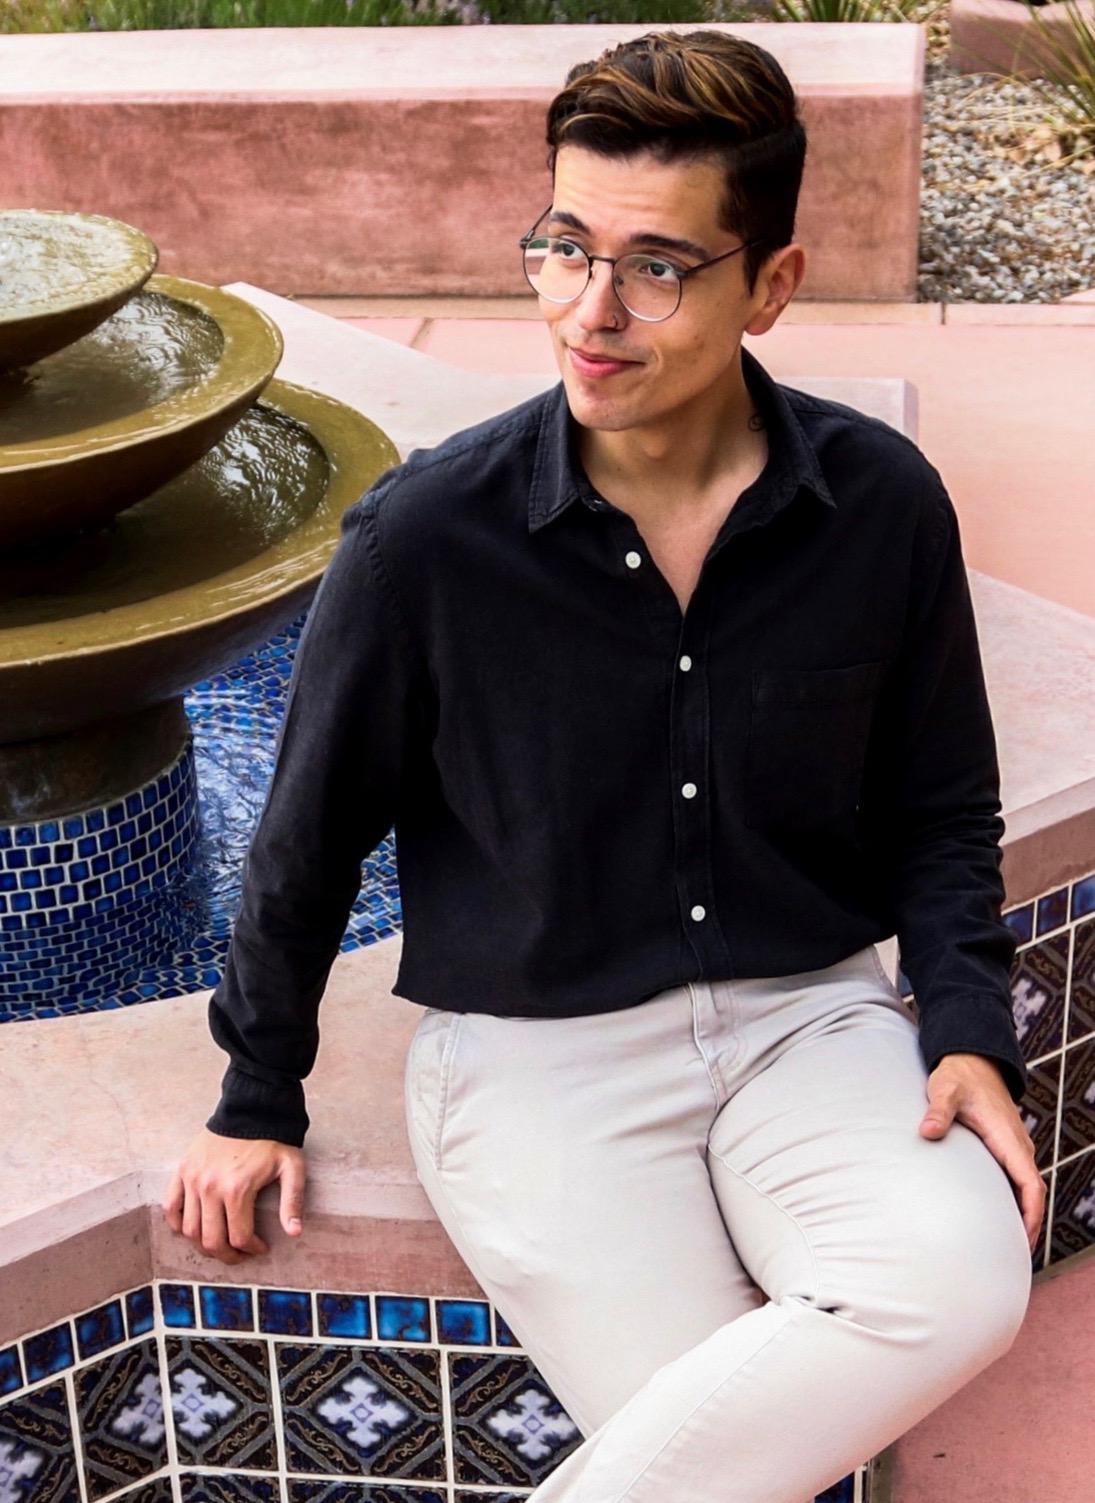 Portrait of David P. Saiz.